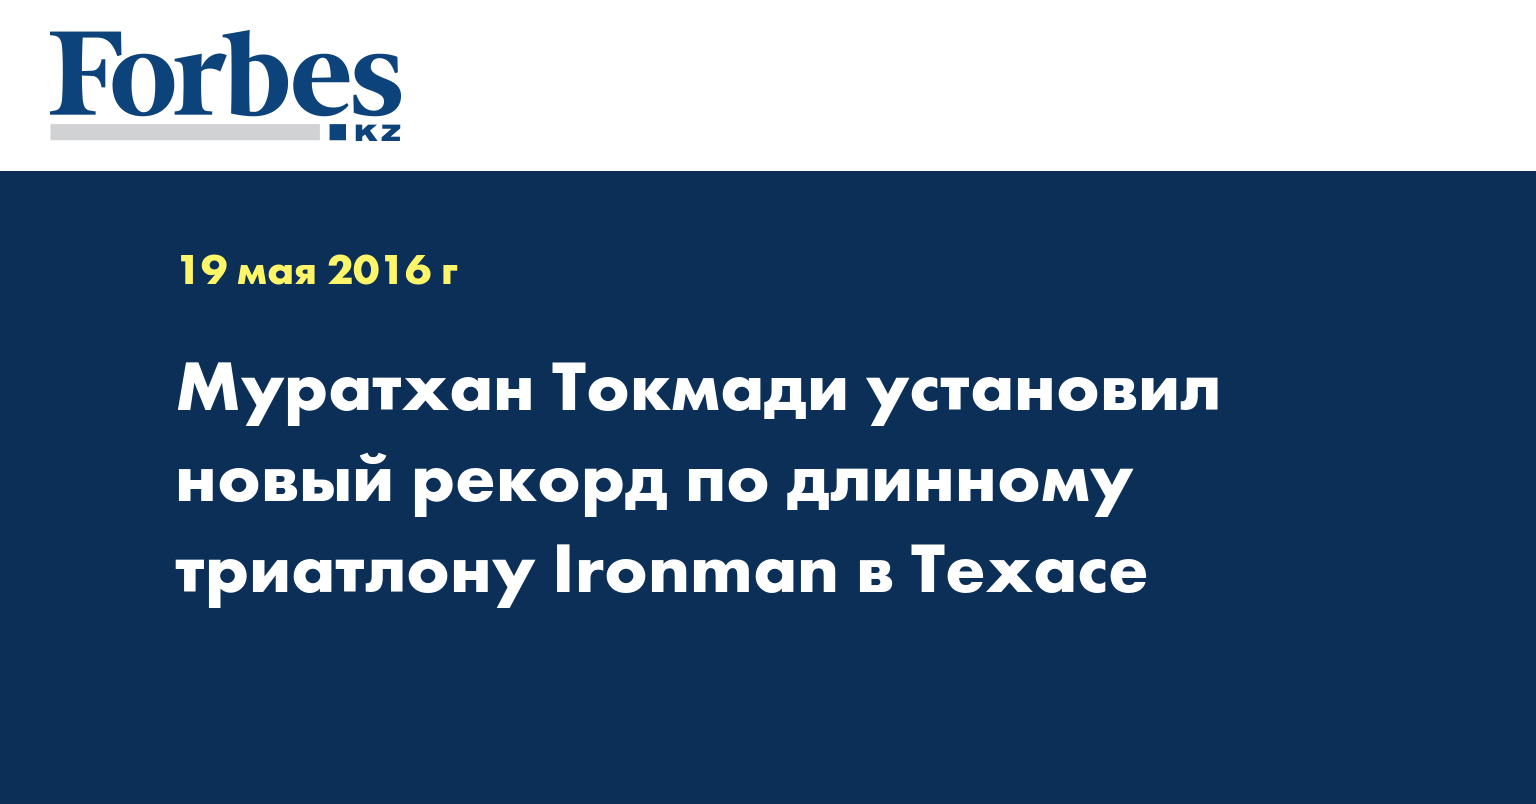 Муратхан Токмади установил новый рекорд по длинному триатлону Ironman в Техасе